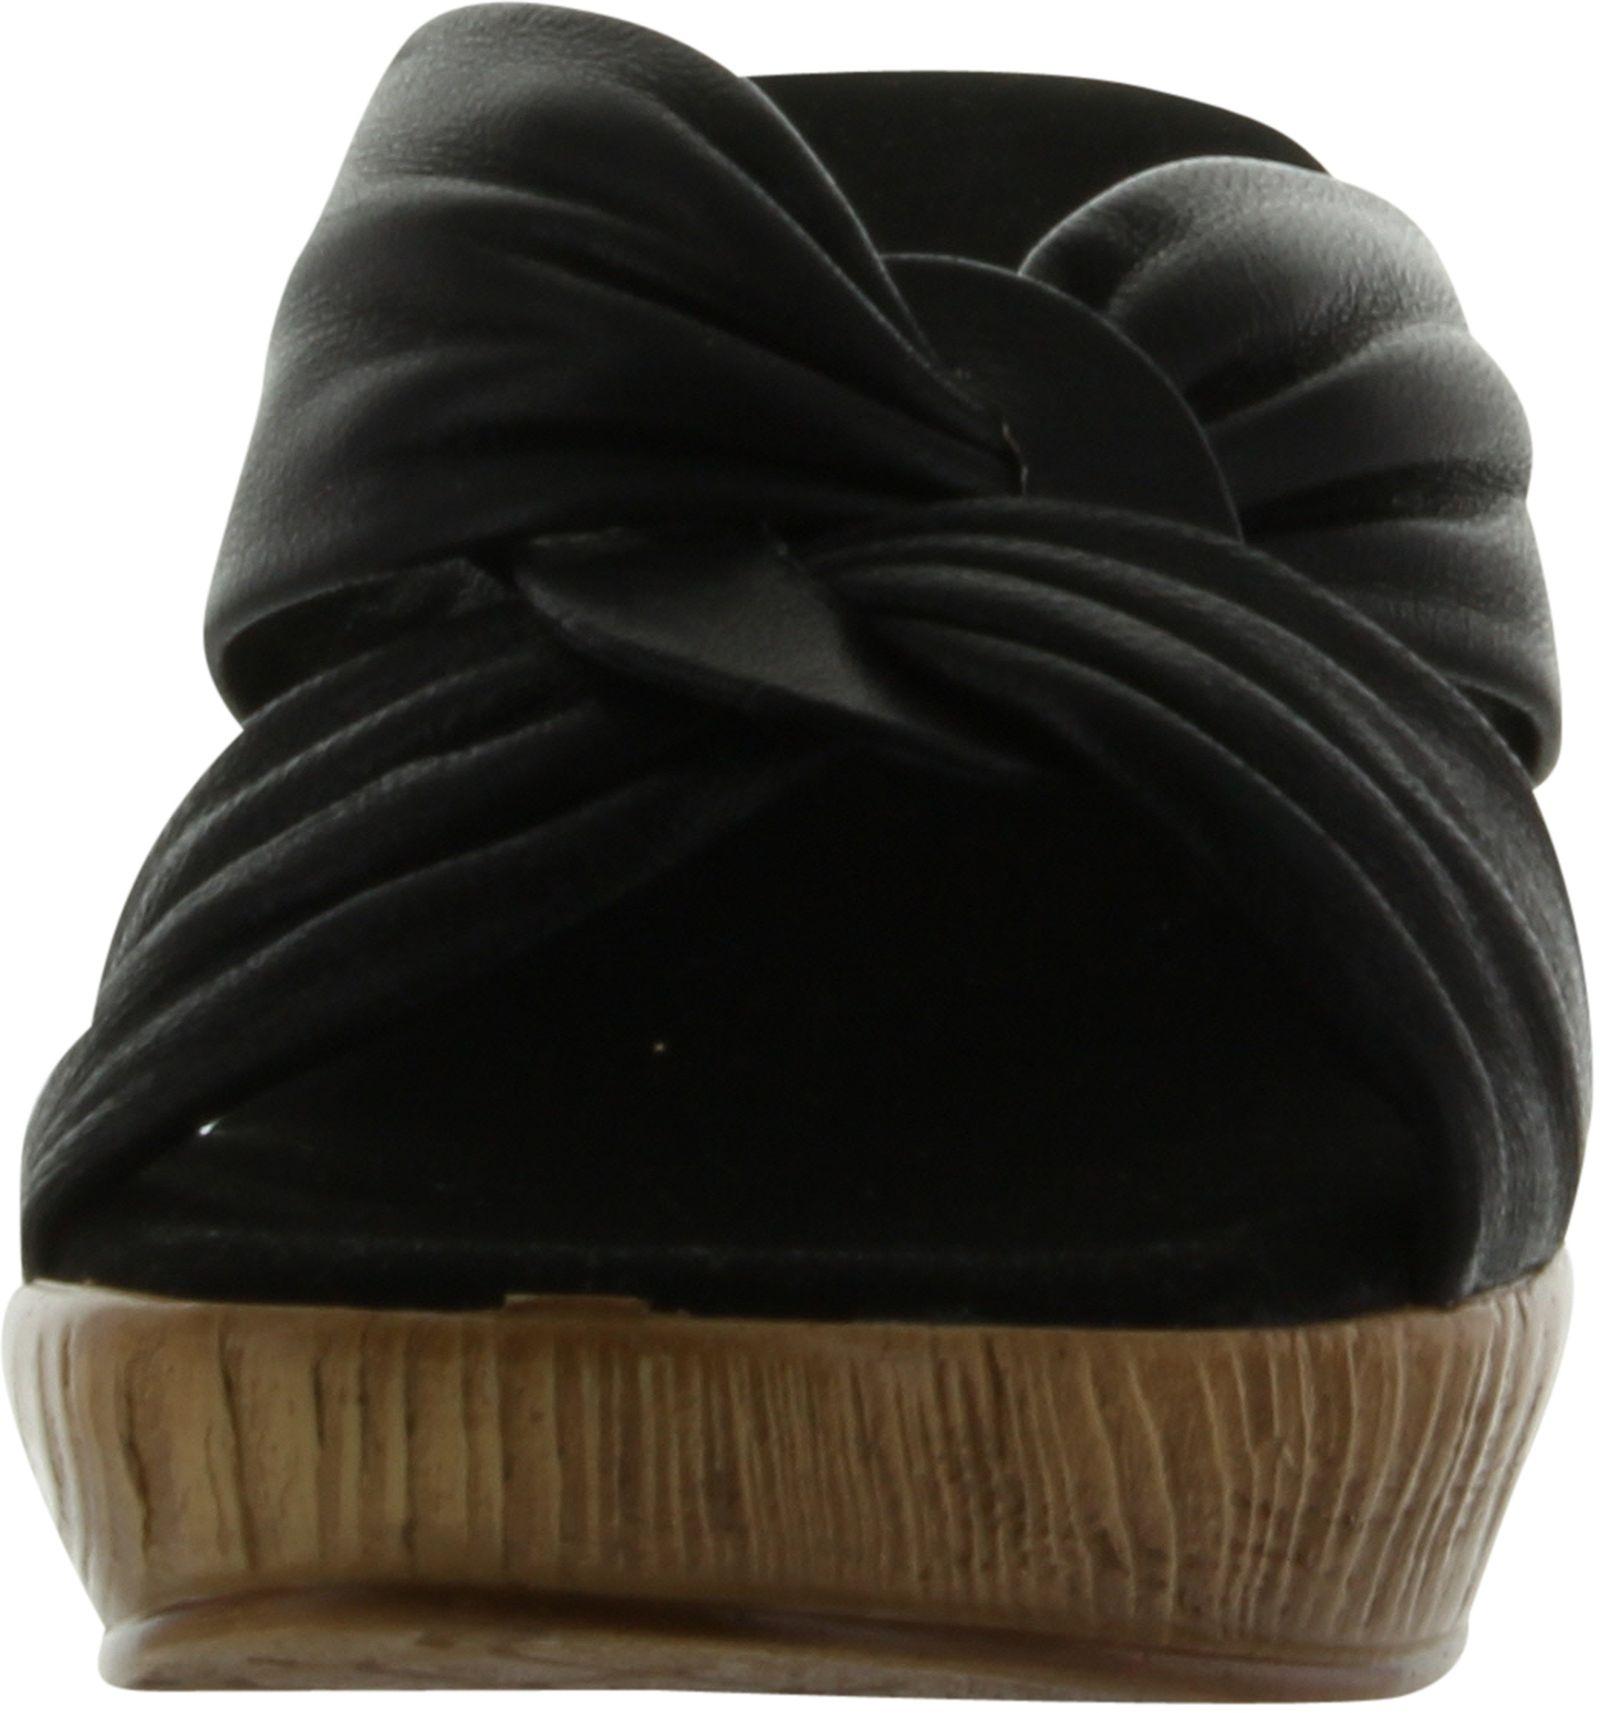 Onex Onex Onex Women's Puffy Wedge Sandal bf86d2